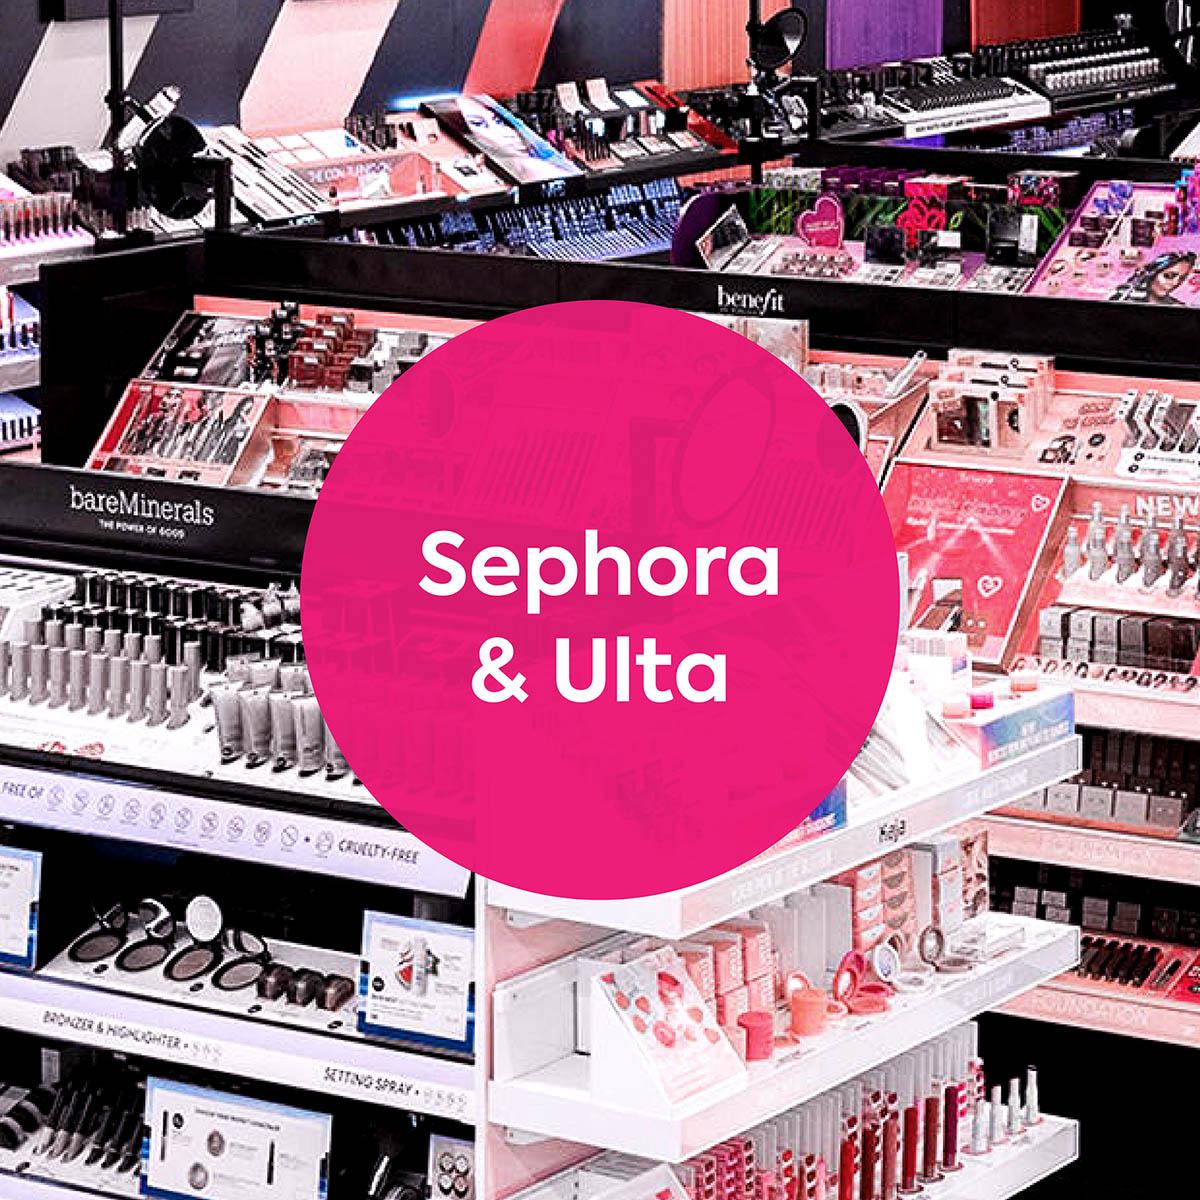 Available at Sephora & Ulta